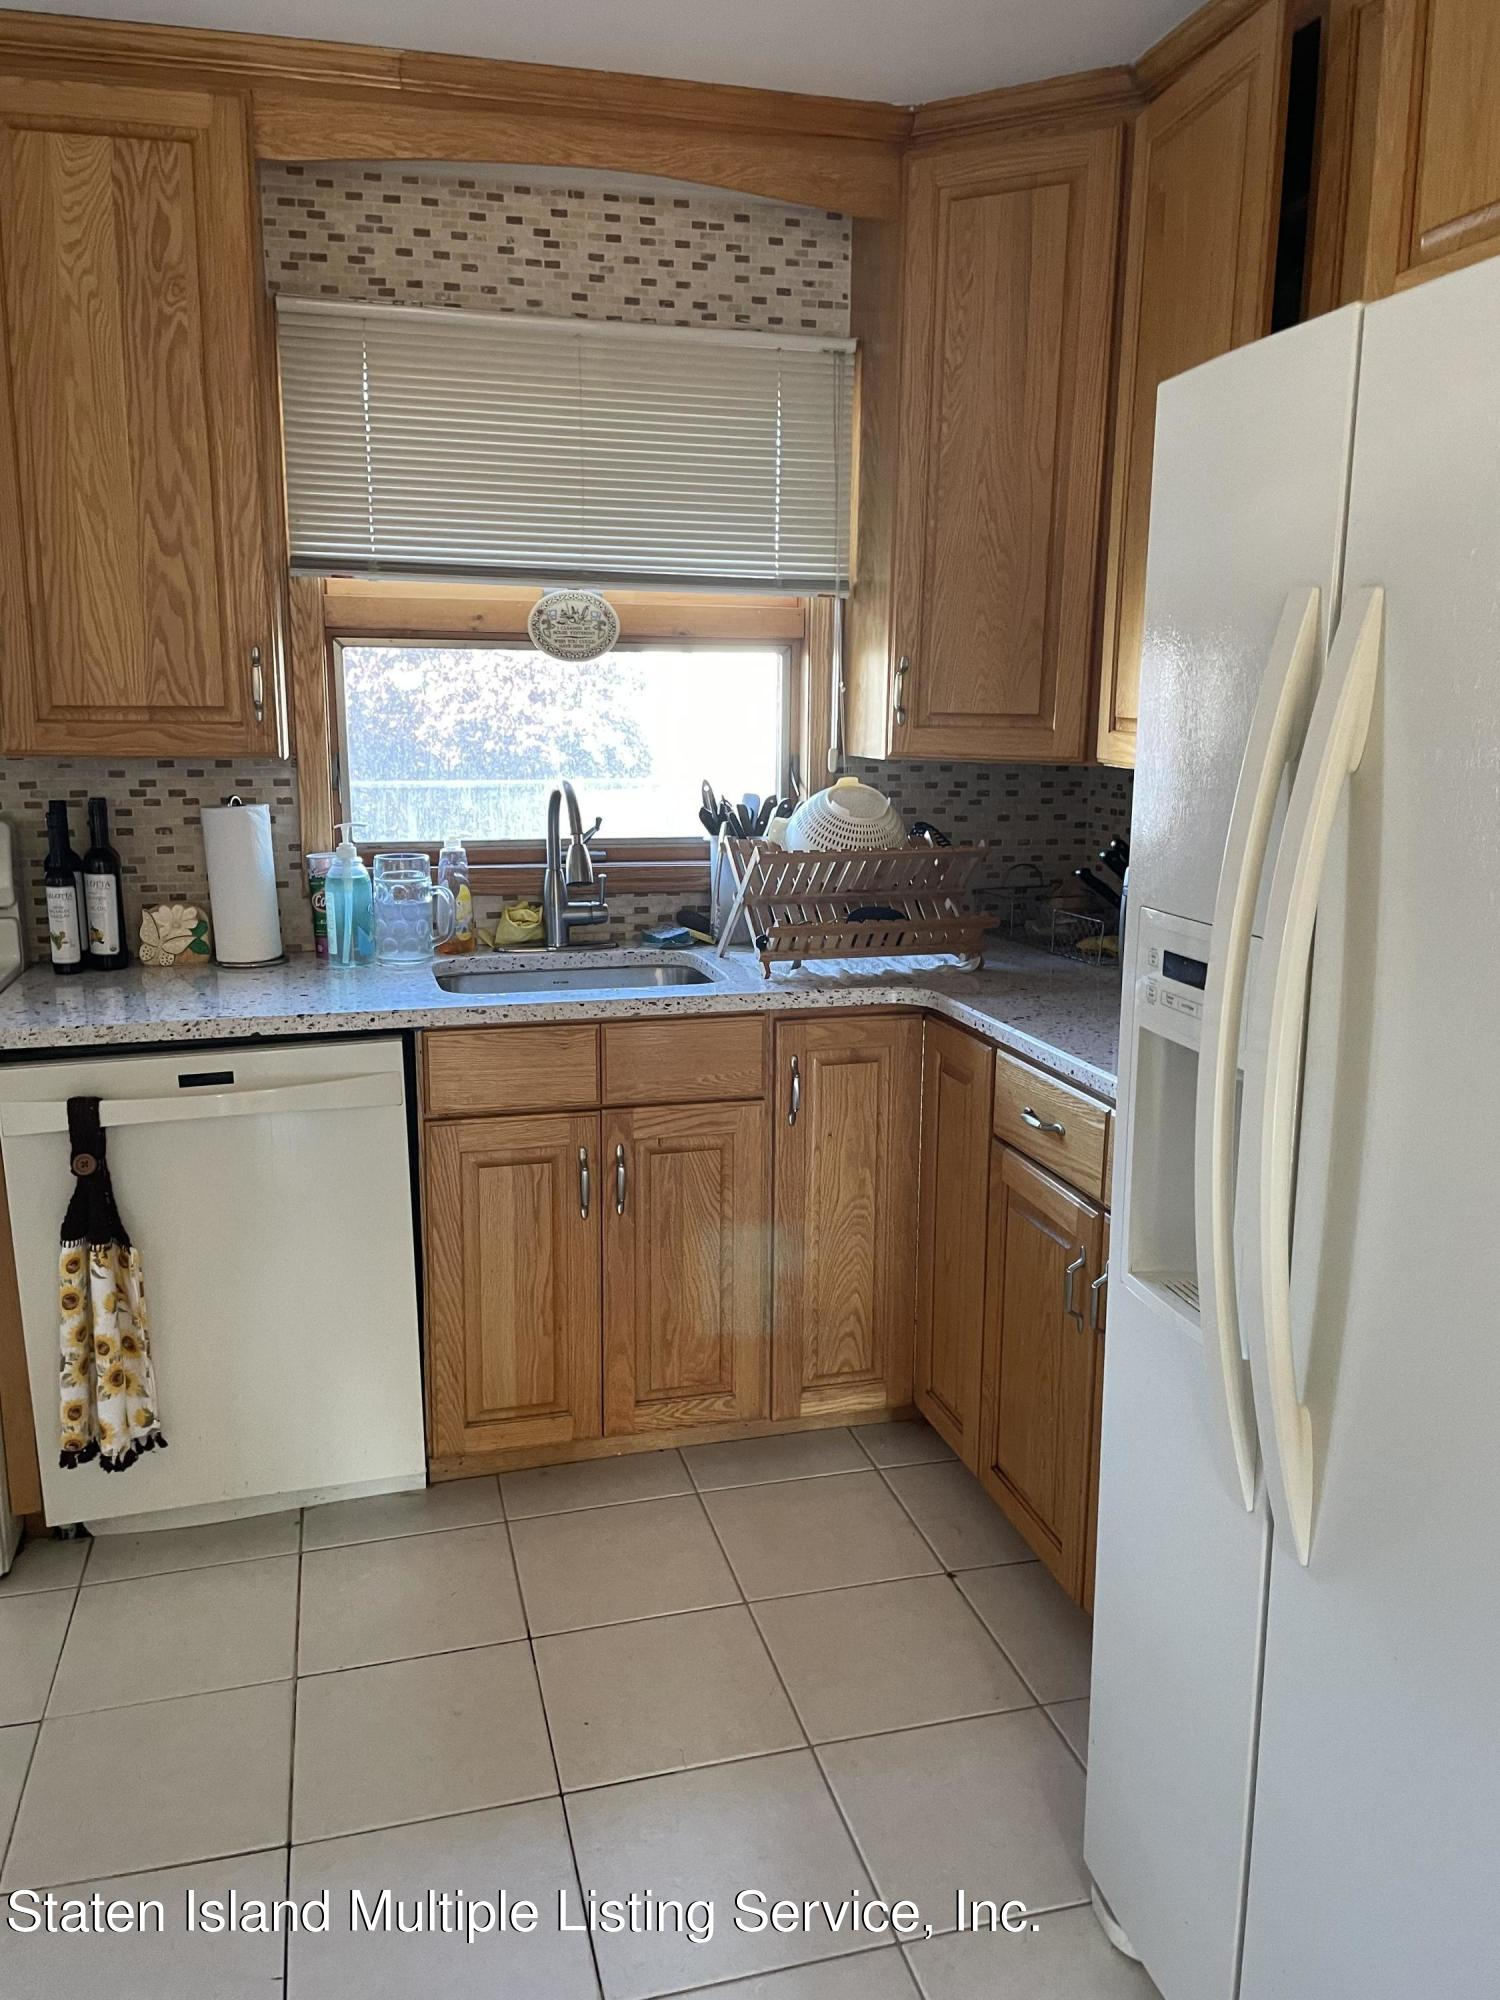 Single Family - Semi-Attached 453 Eltingville Boulevard  Staten Island, NY 10312, MLS-1147072-2